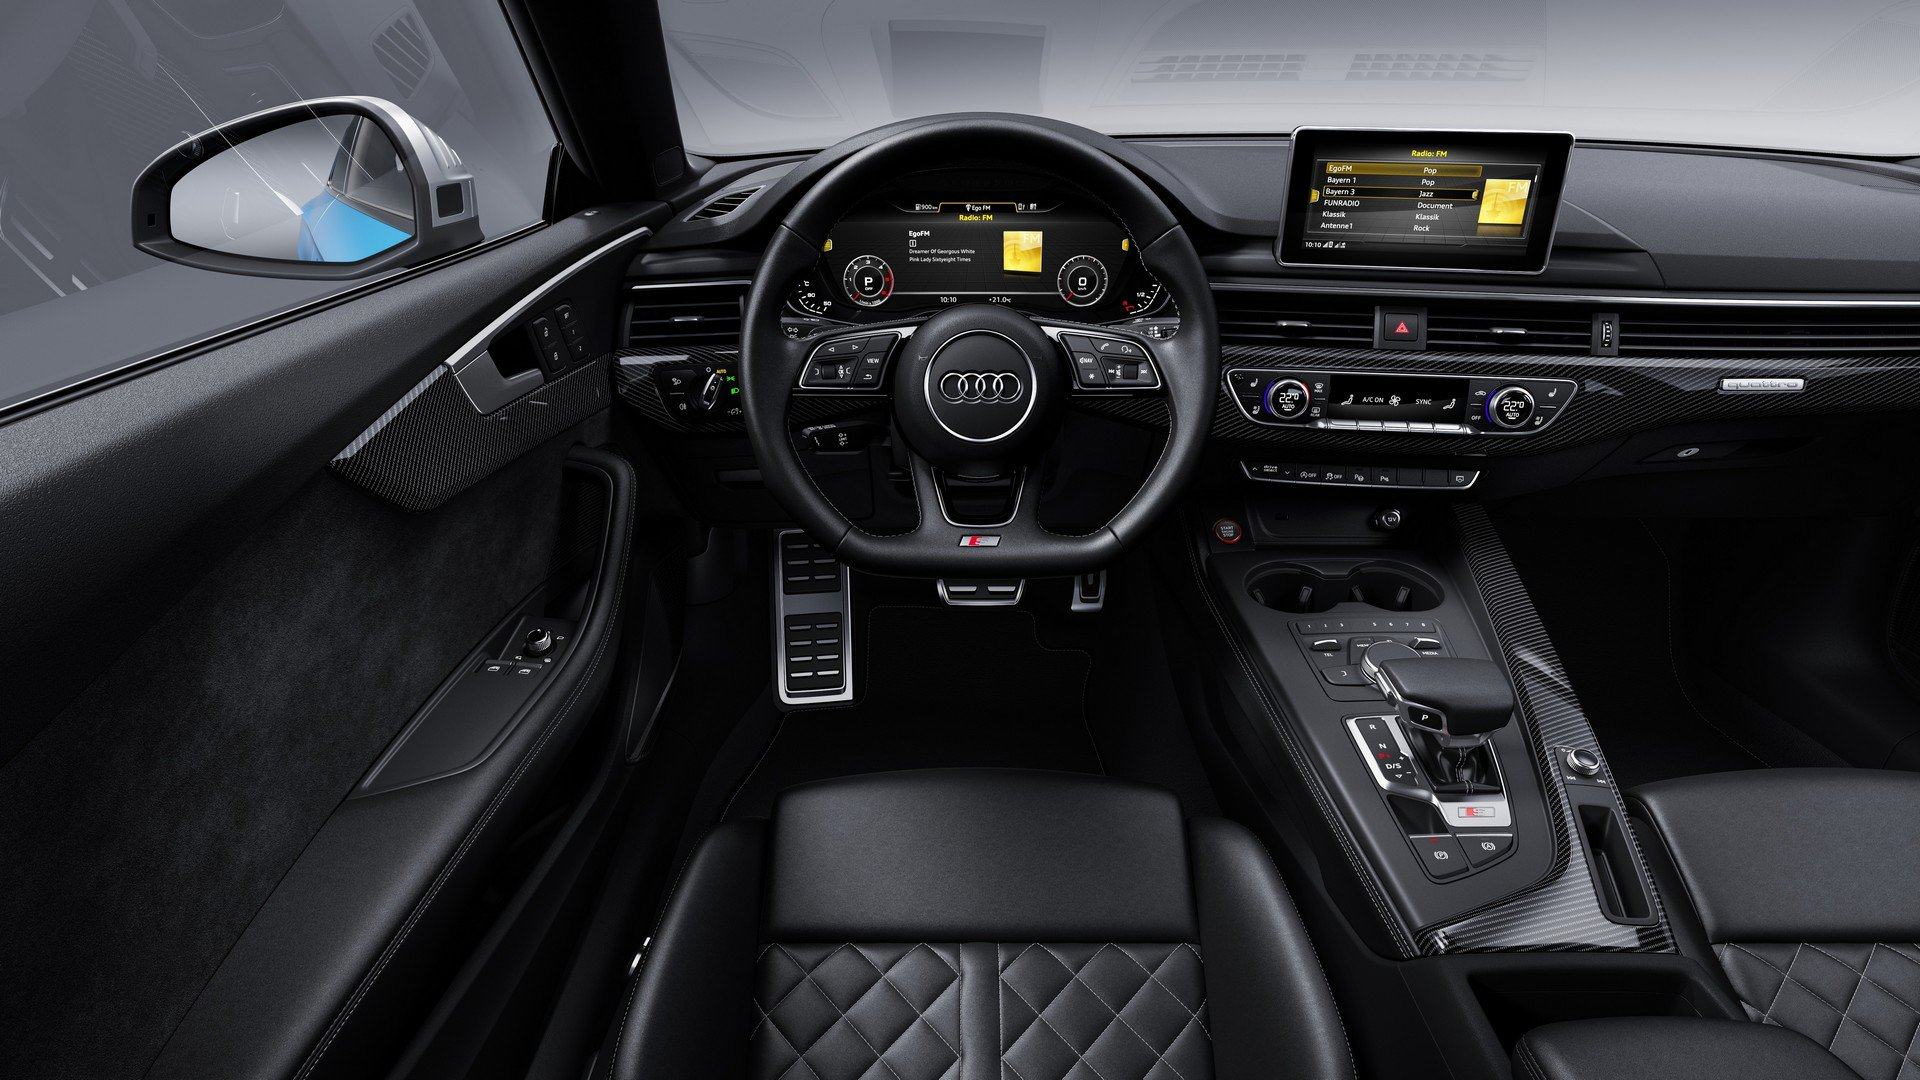 Kelebihan Kekurangan Audi S5 Tdi Murah Berkualitas